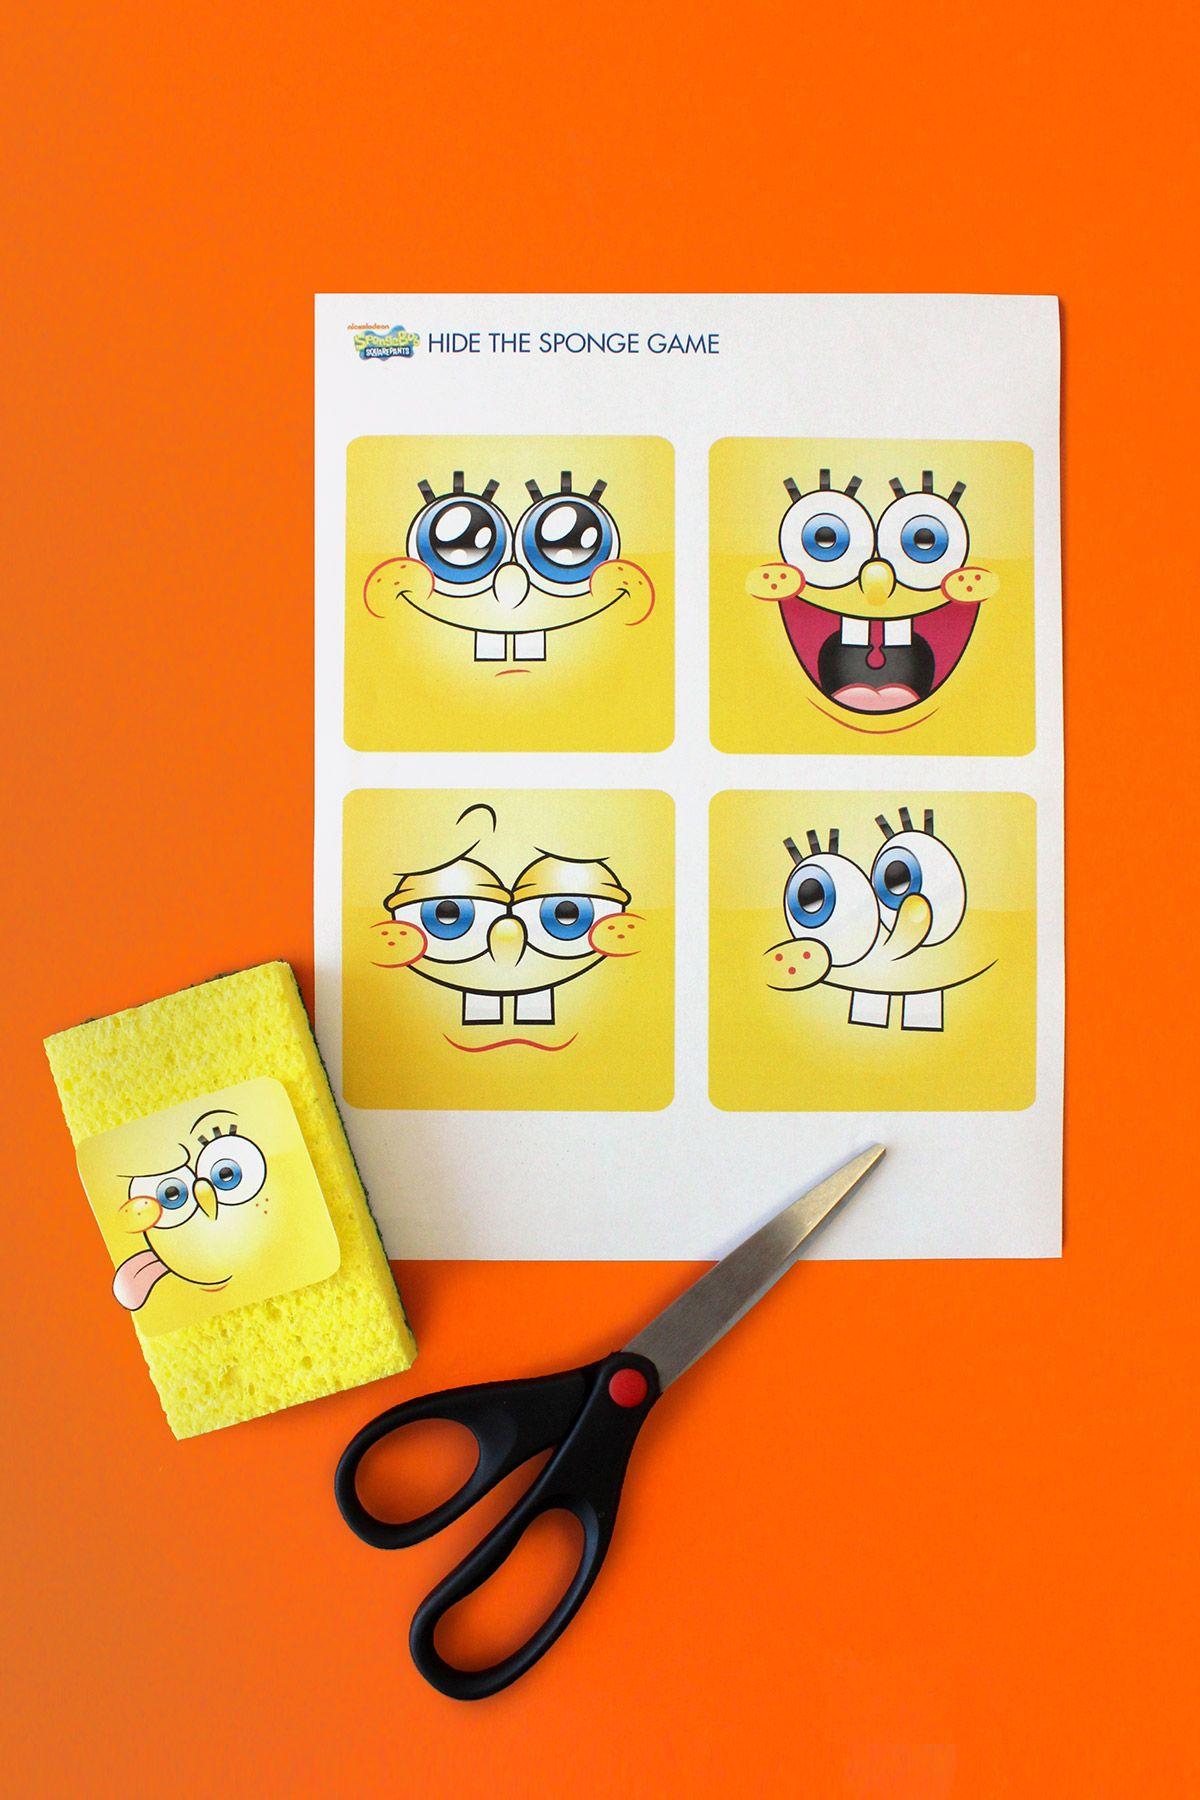 Hide The Spongebob Game